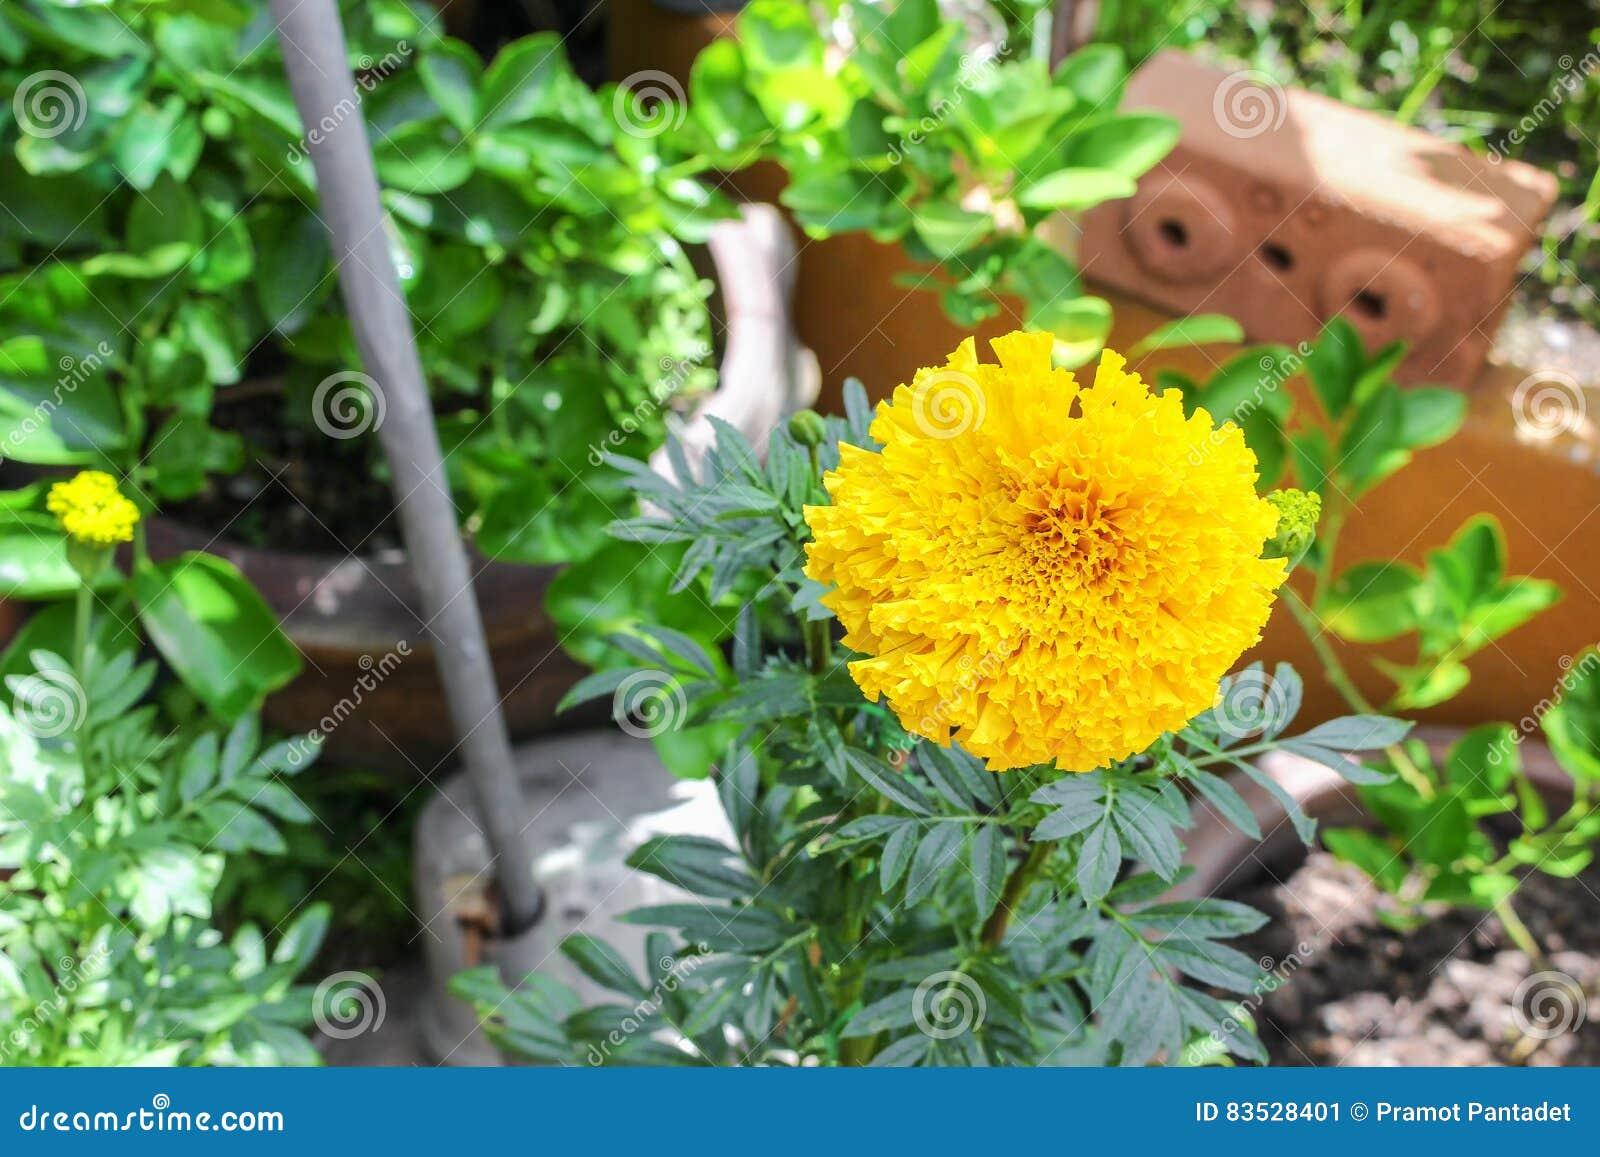 Marigold yellow flowers beautiful marigold india flower stock image download marigold yellow flowers beautiful marigold india flower stock image image of colorful mightylinksfo